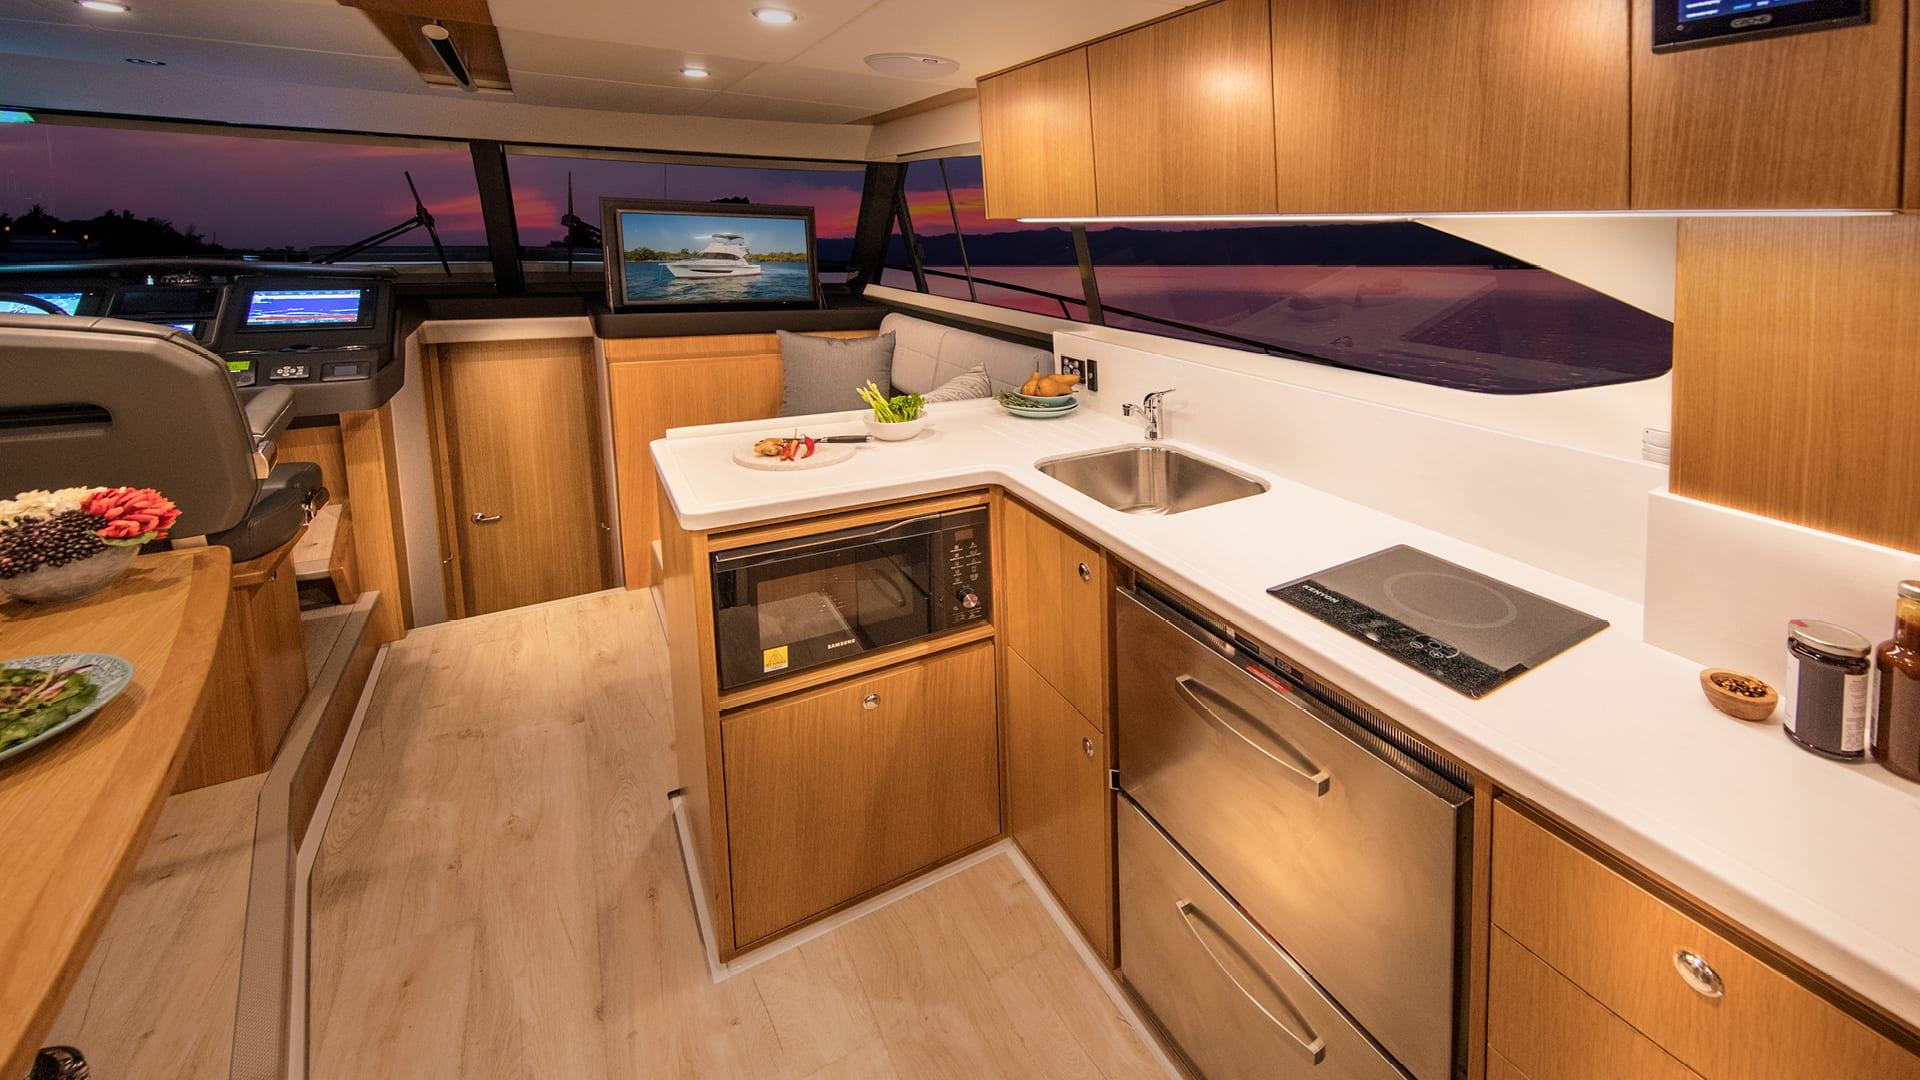 39 Sports Motor Yacht - Riviera - Australia's Premium Luxury Motor